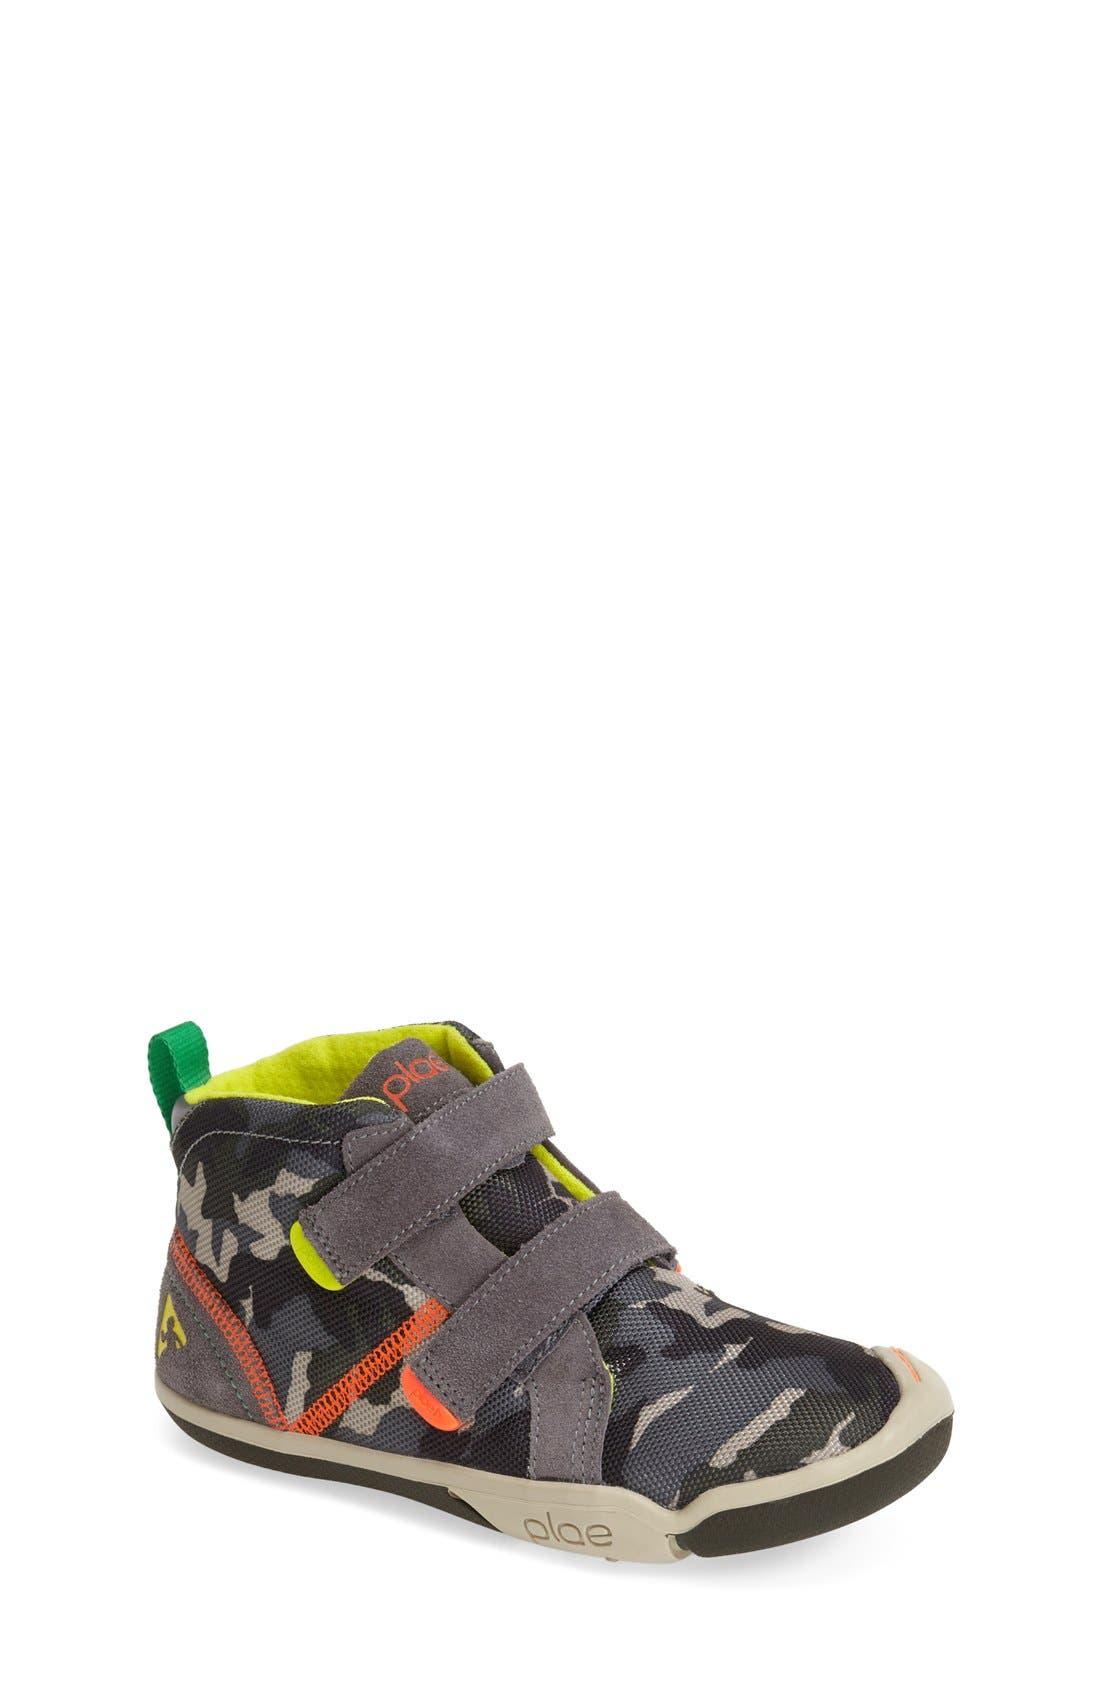 'Max' Customizable High Top Sneaker,                         Main,                         color, 054